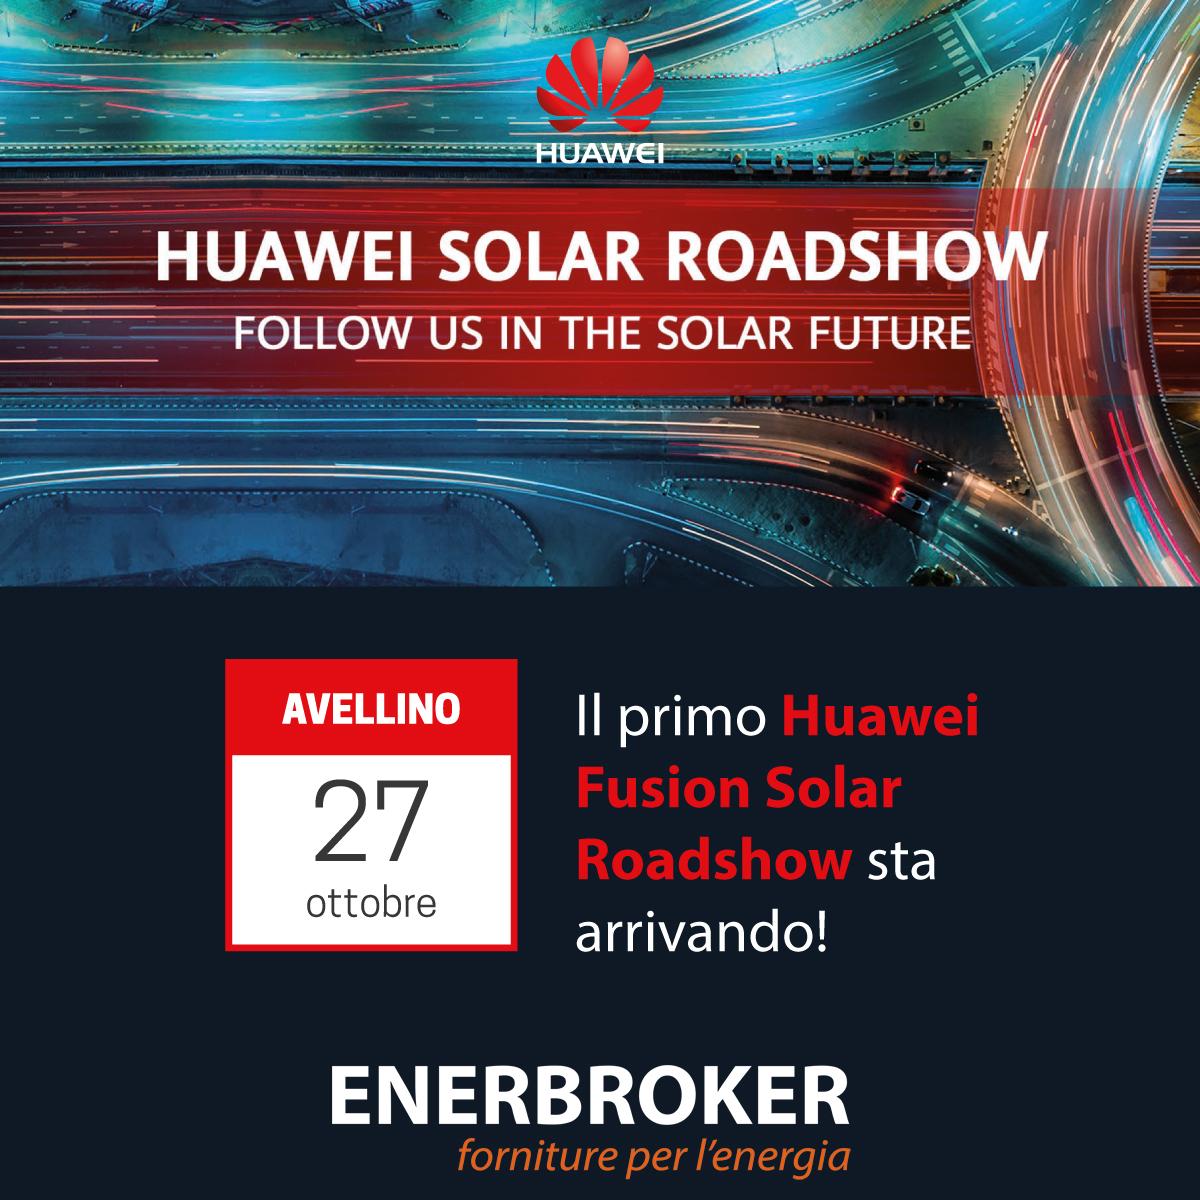 EnerBroker ospita il primo Huawei FusionSolar Roadshow